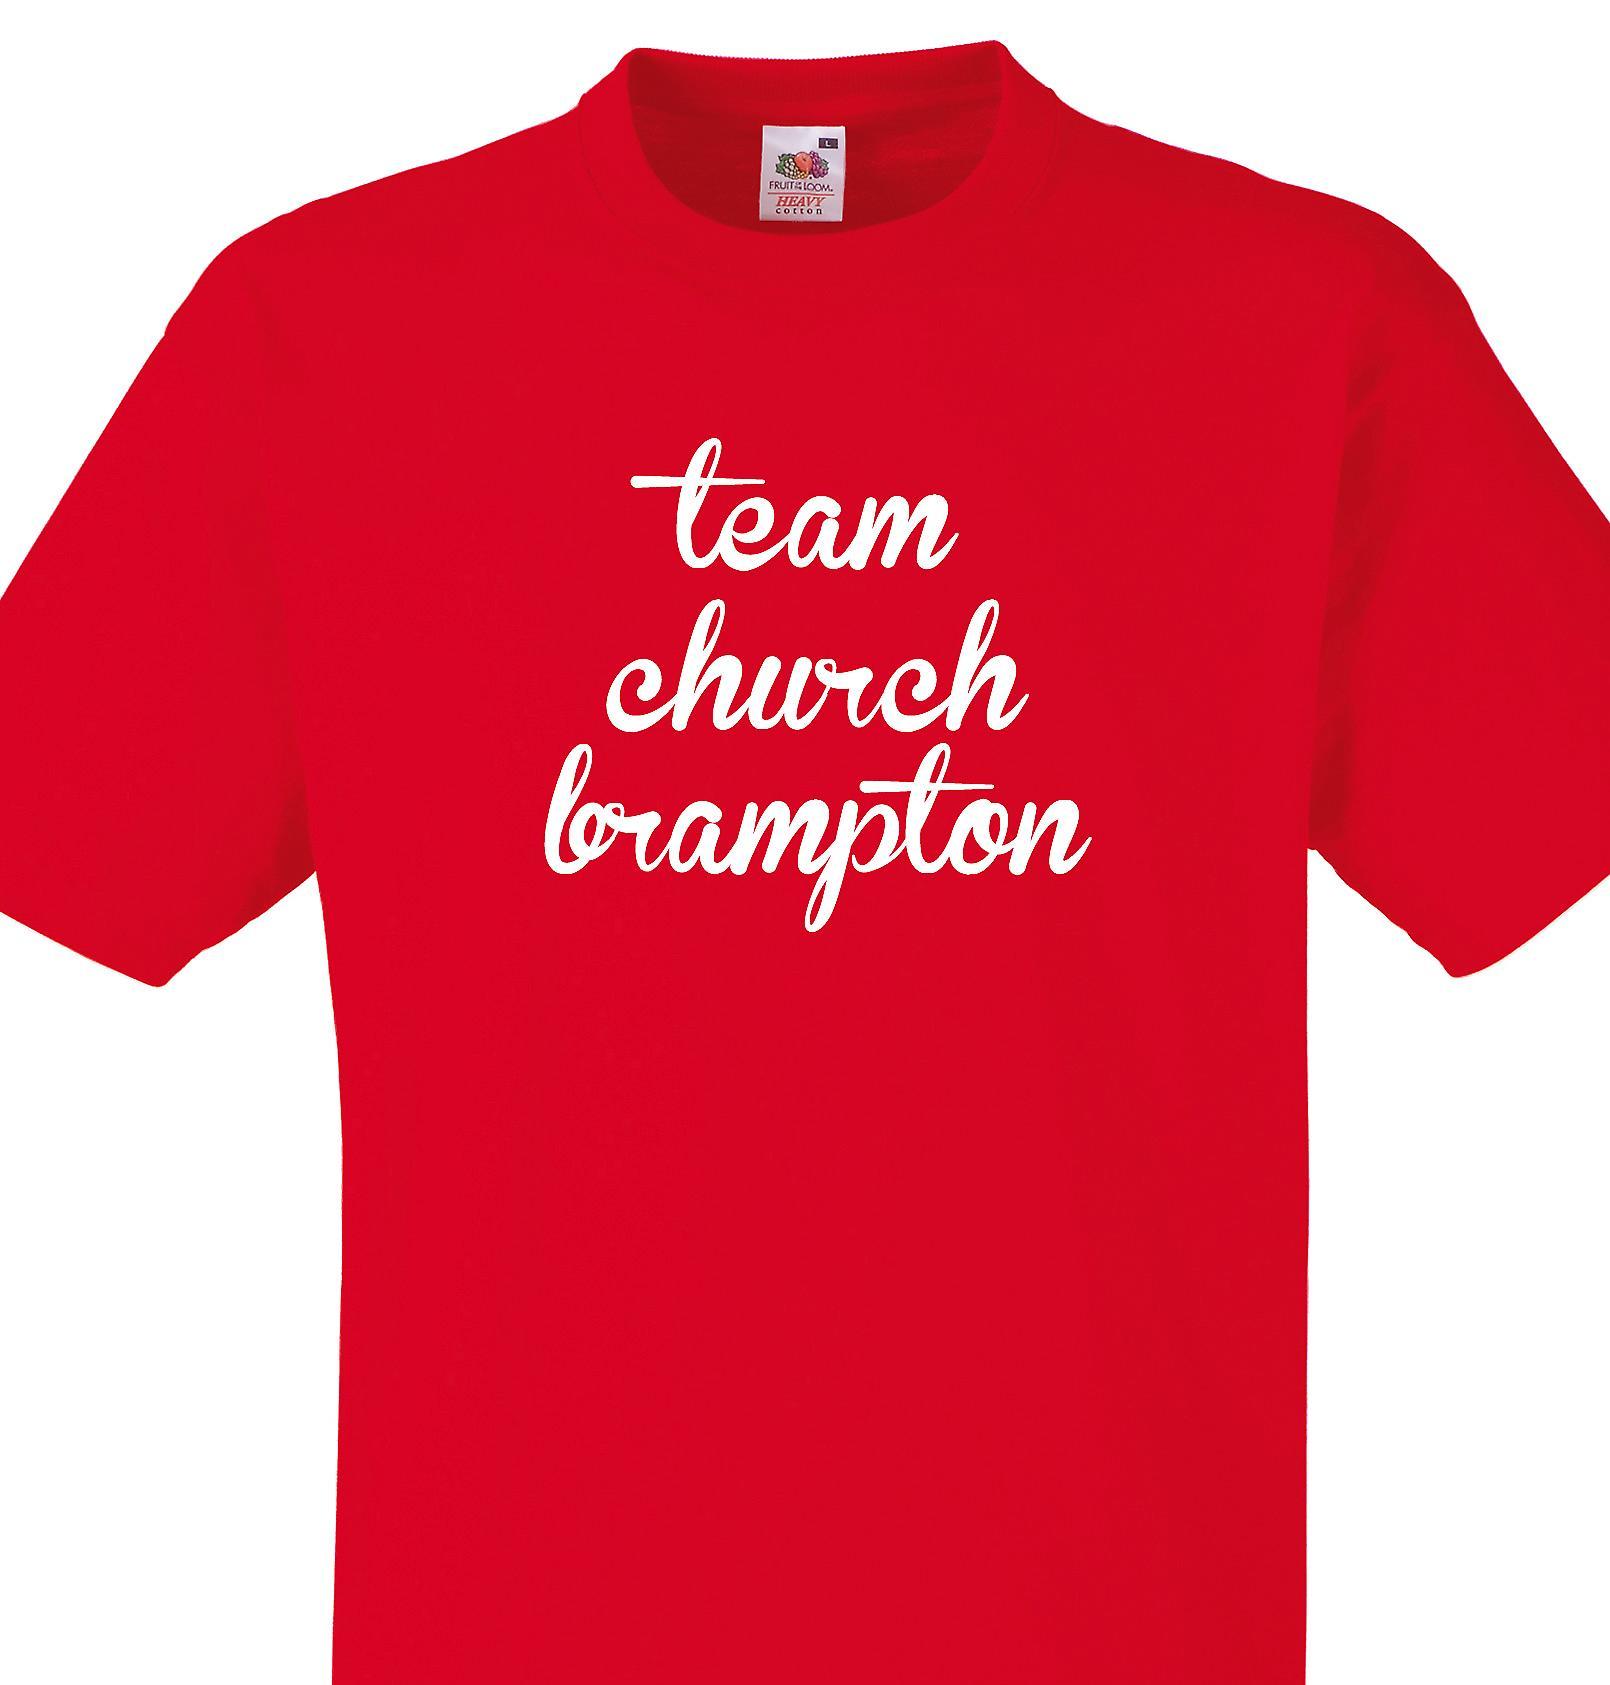 Team Church brampton Red T shirt